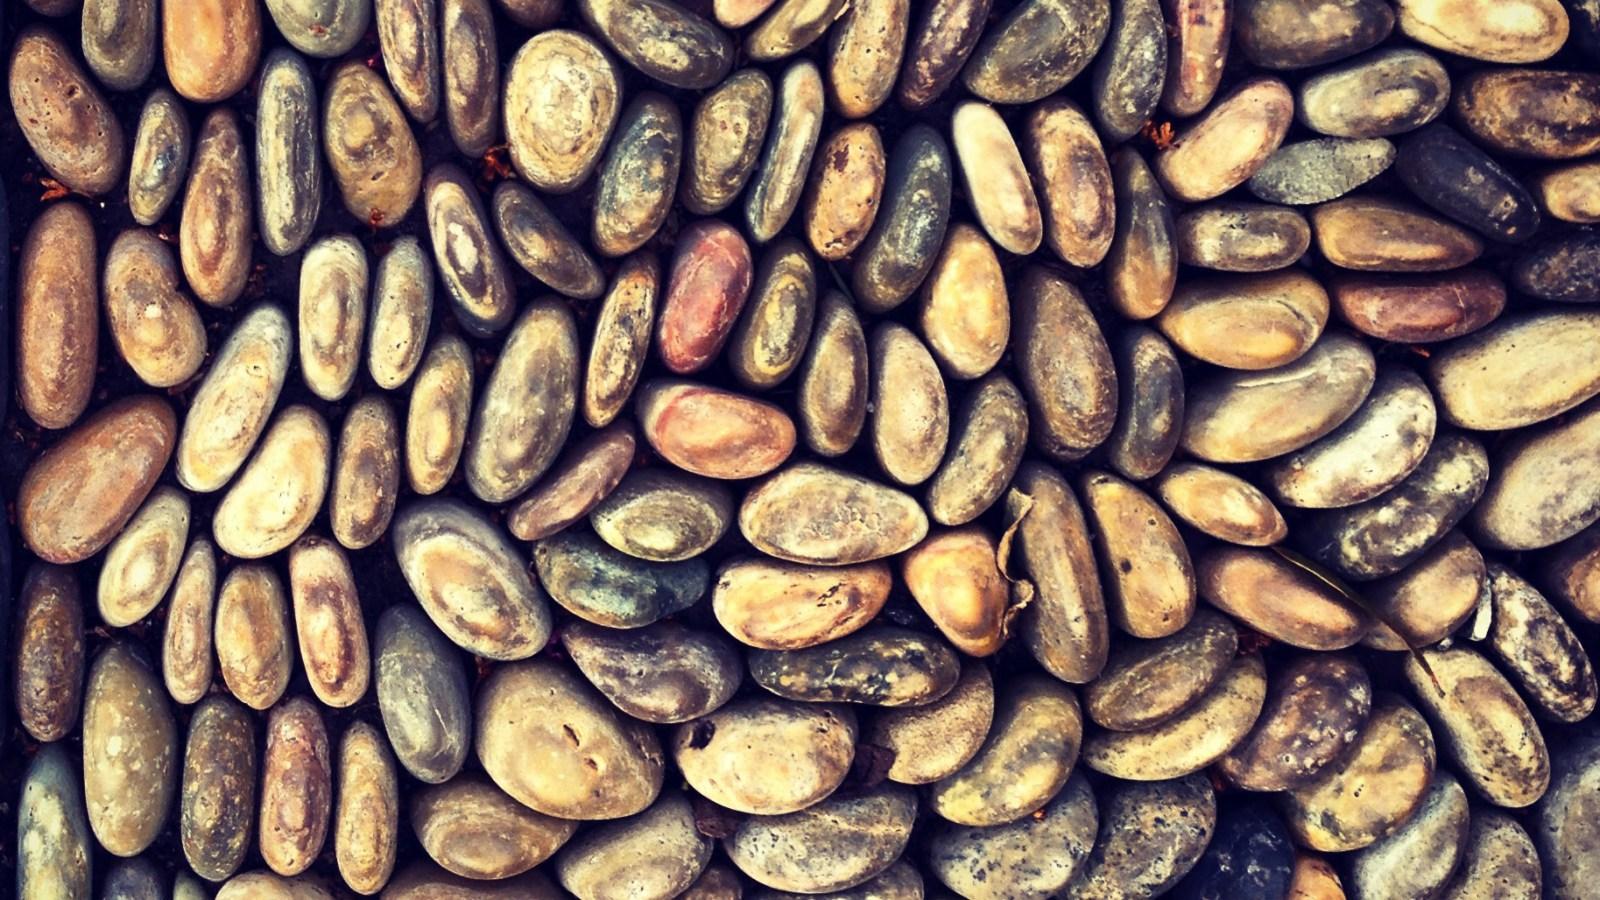 Disorganized Stones